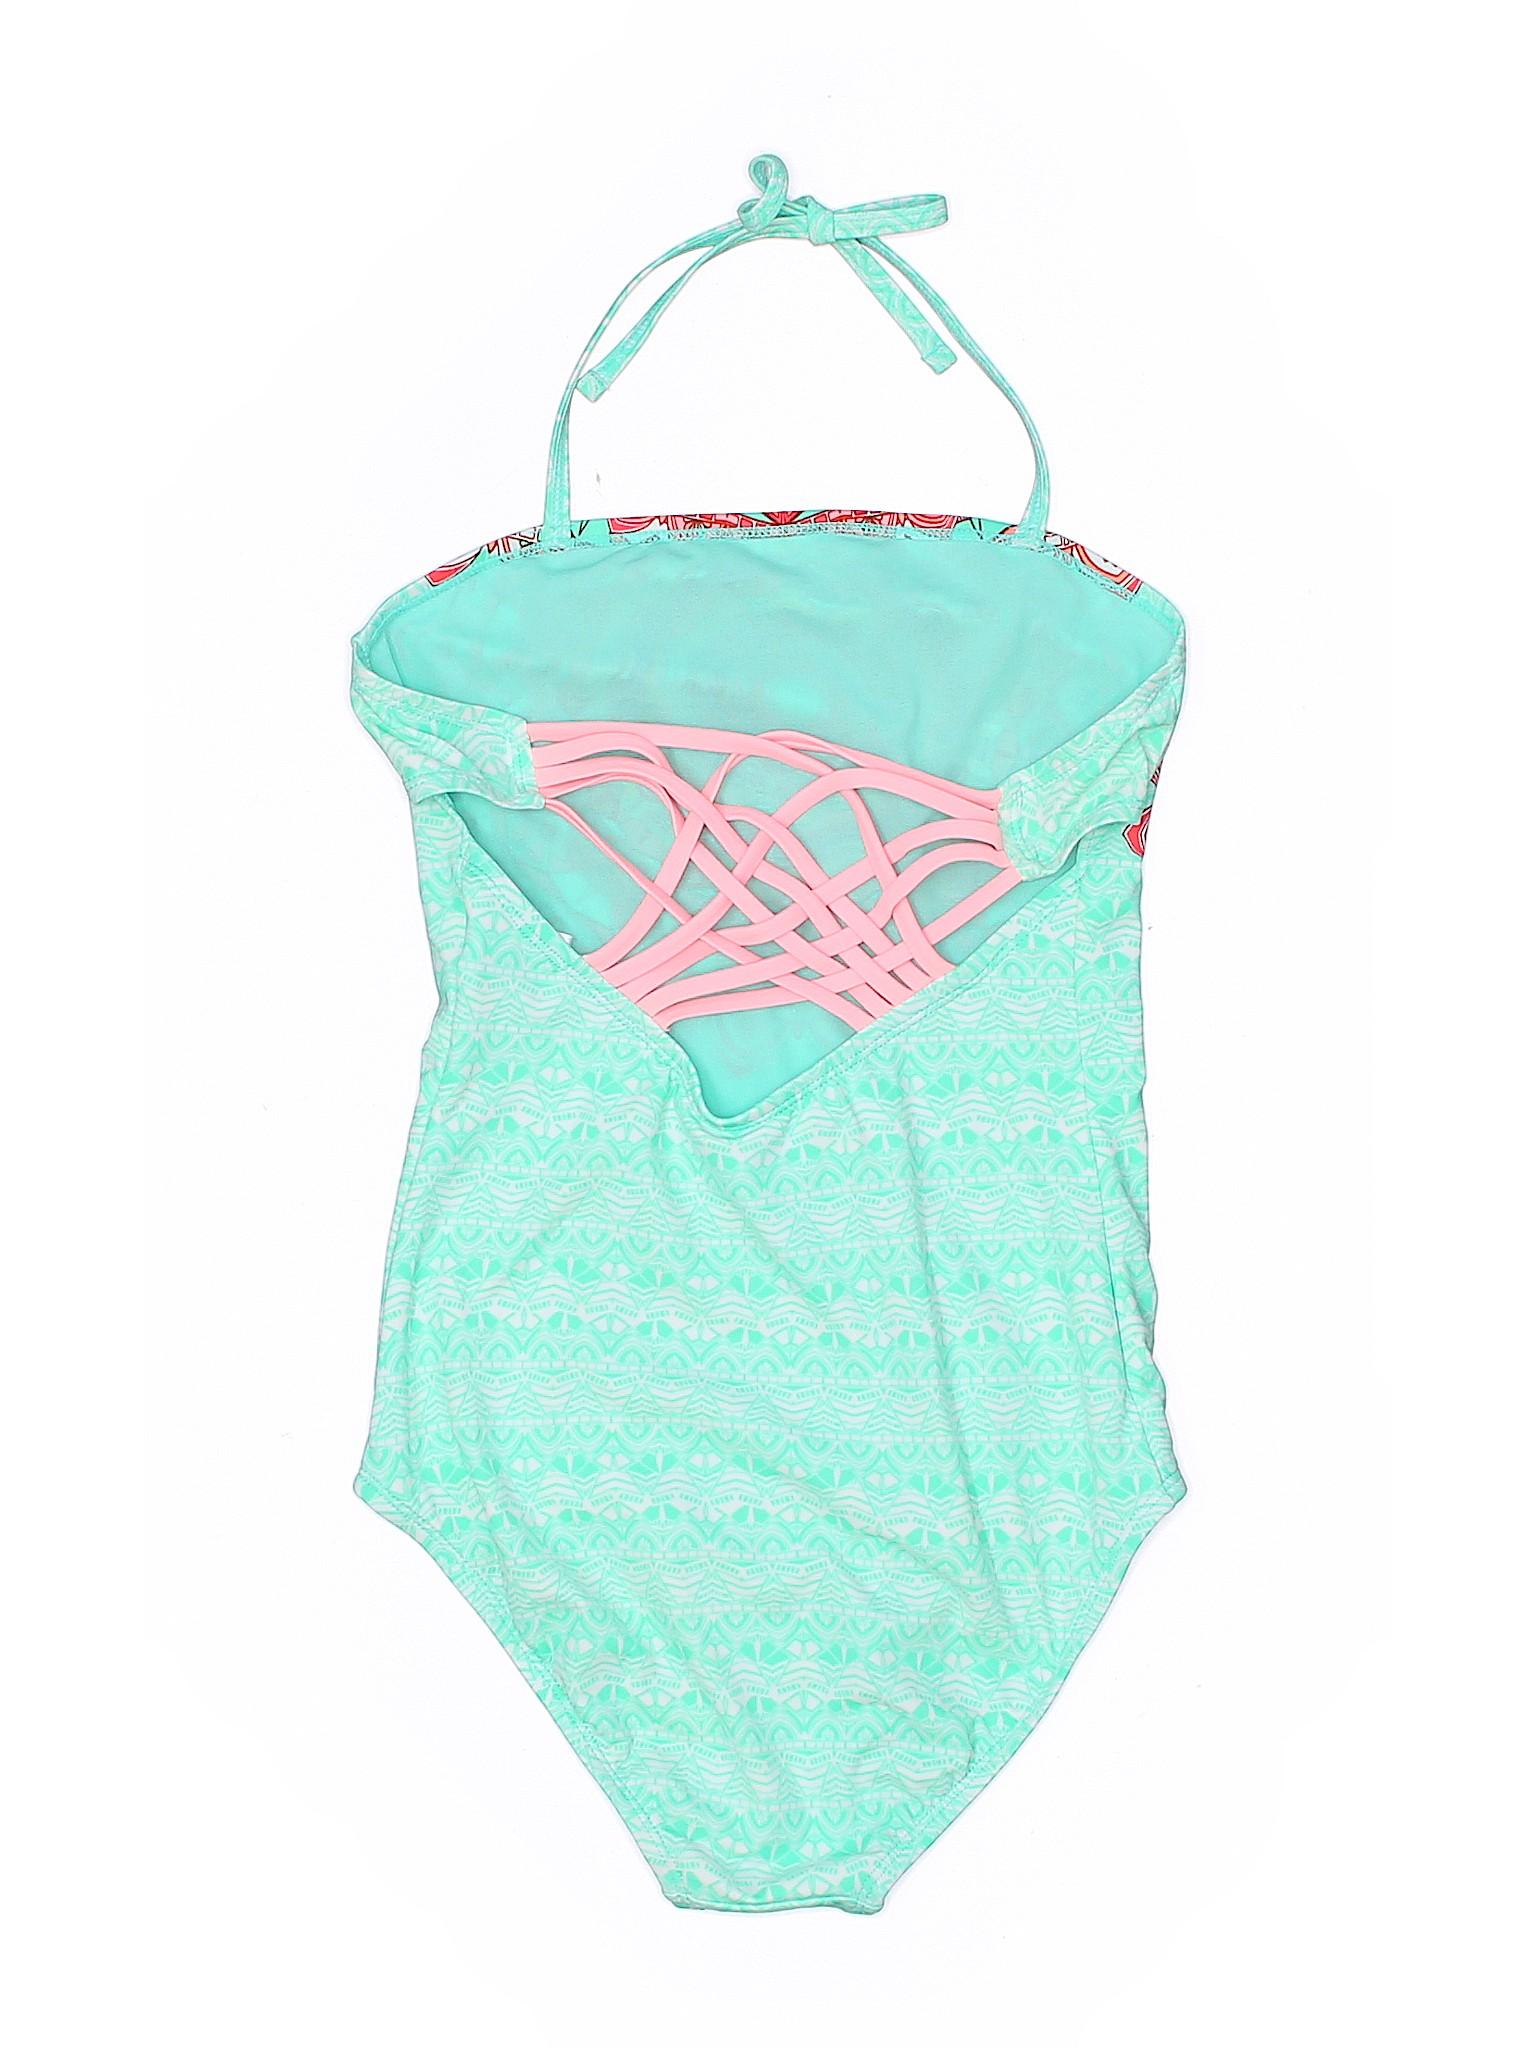 Piece Gossip One Boutique Swimsuit Girl FtZwxS